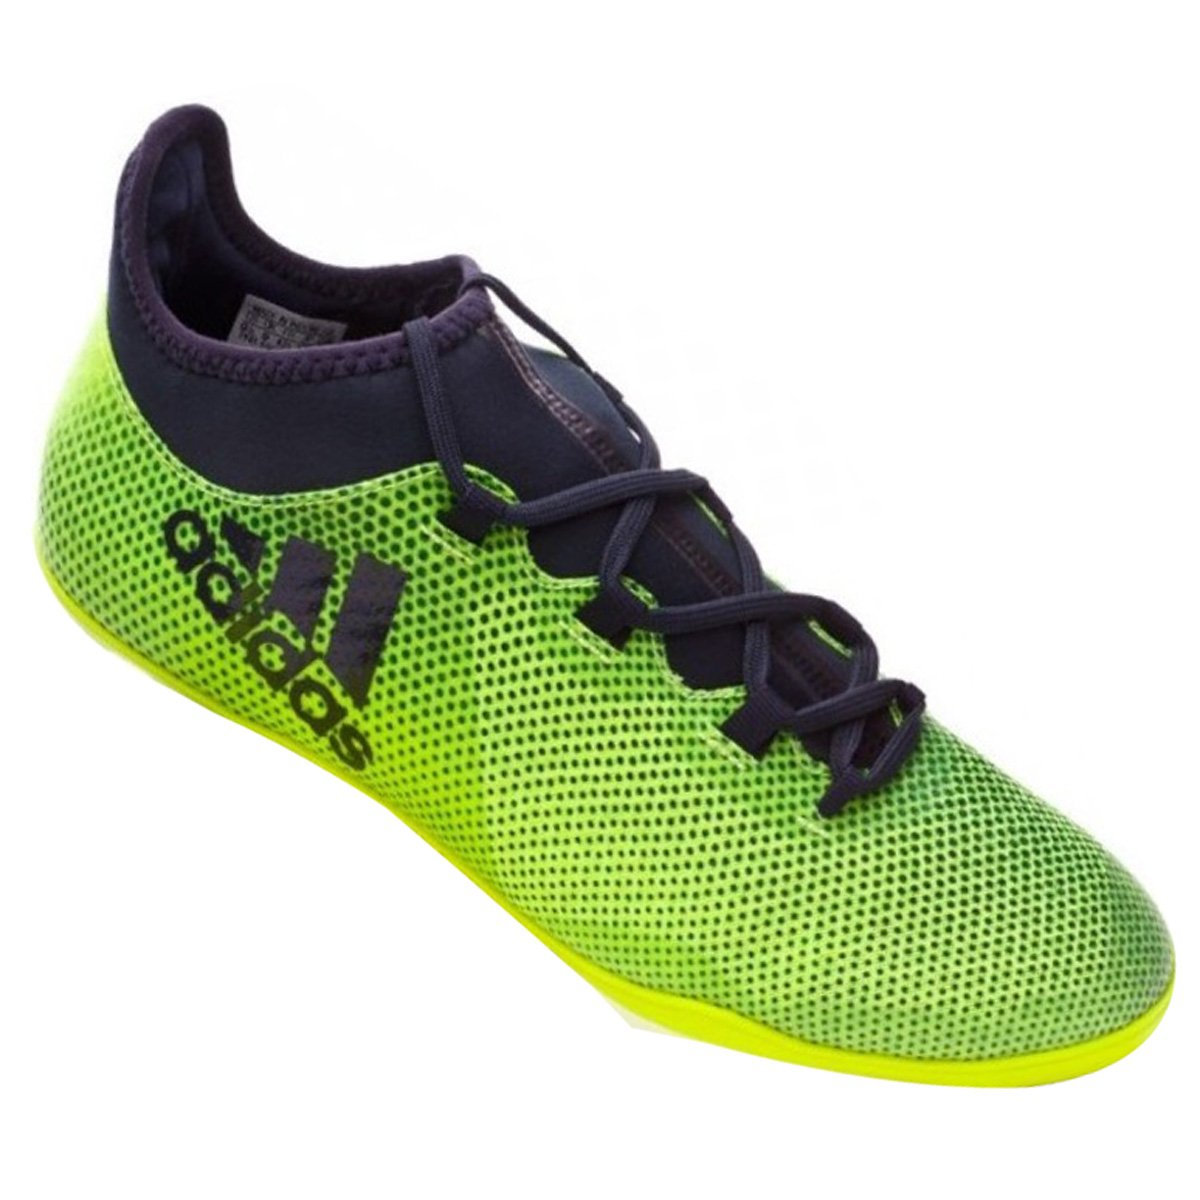 551bb38525087 Indoor Masculino Adidas X Tango 17.3 CG3717 Verde Preto